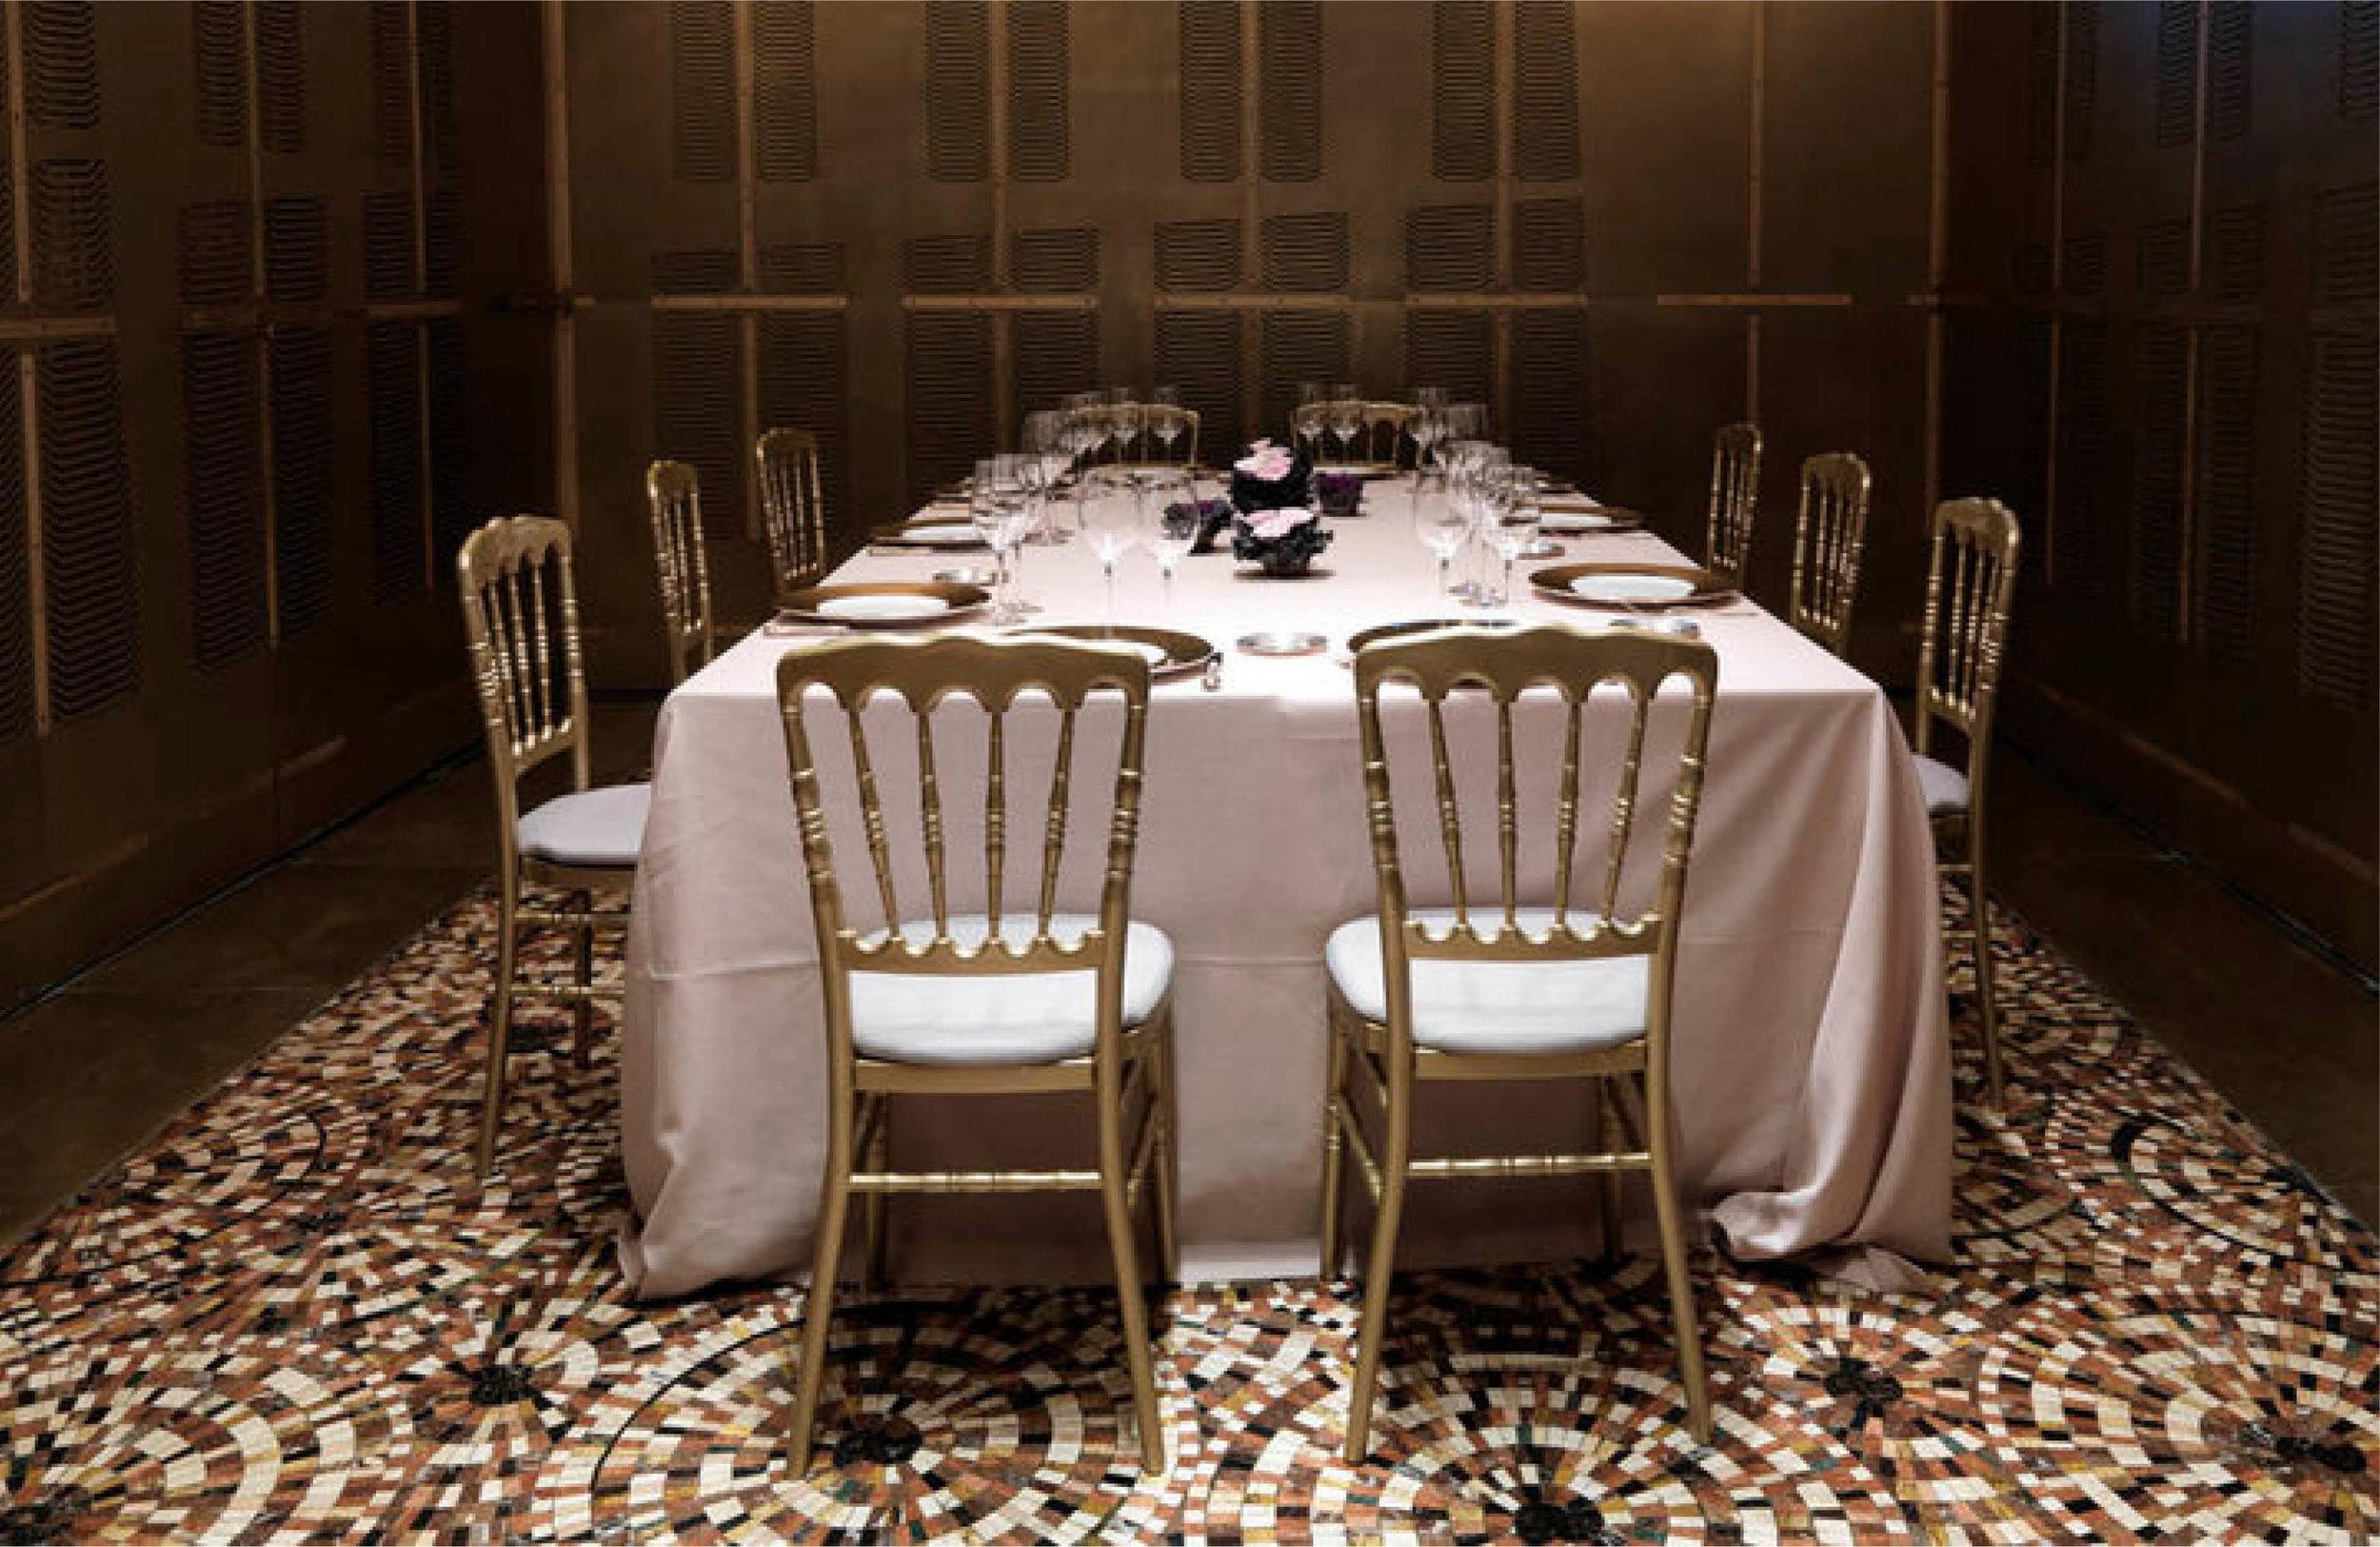 Merces-one-restaurante-una-sola-mesa